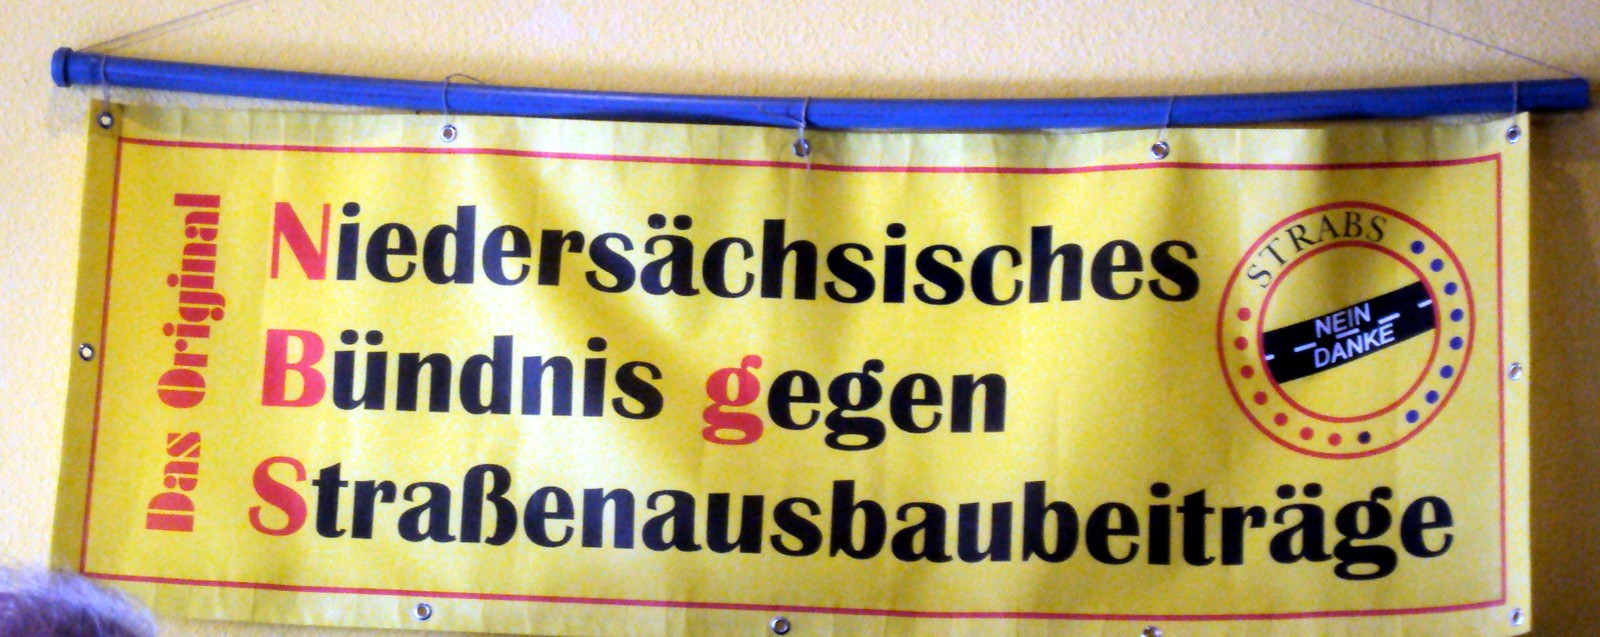 Laatzen Banner.JPG